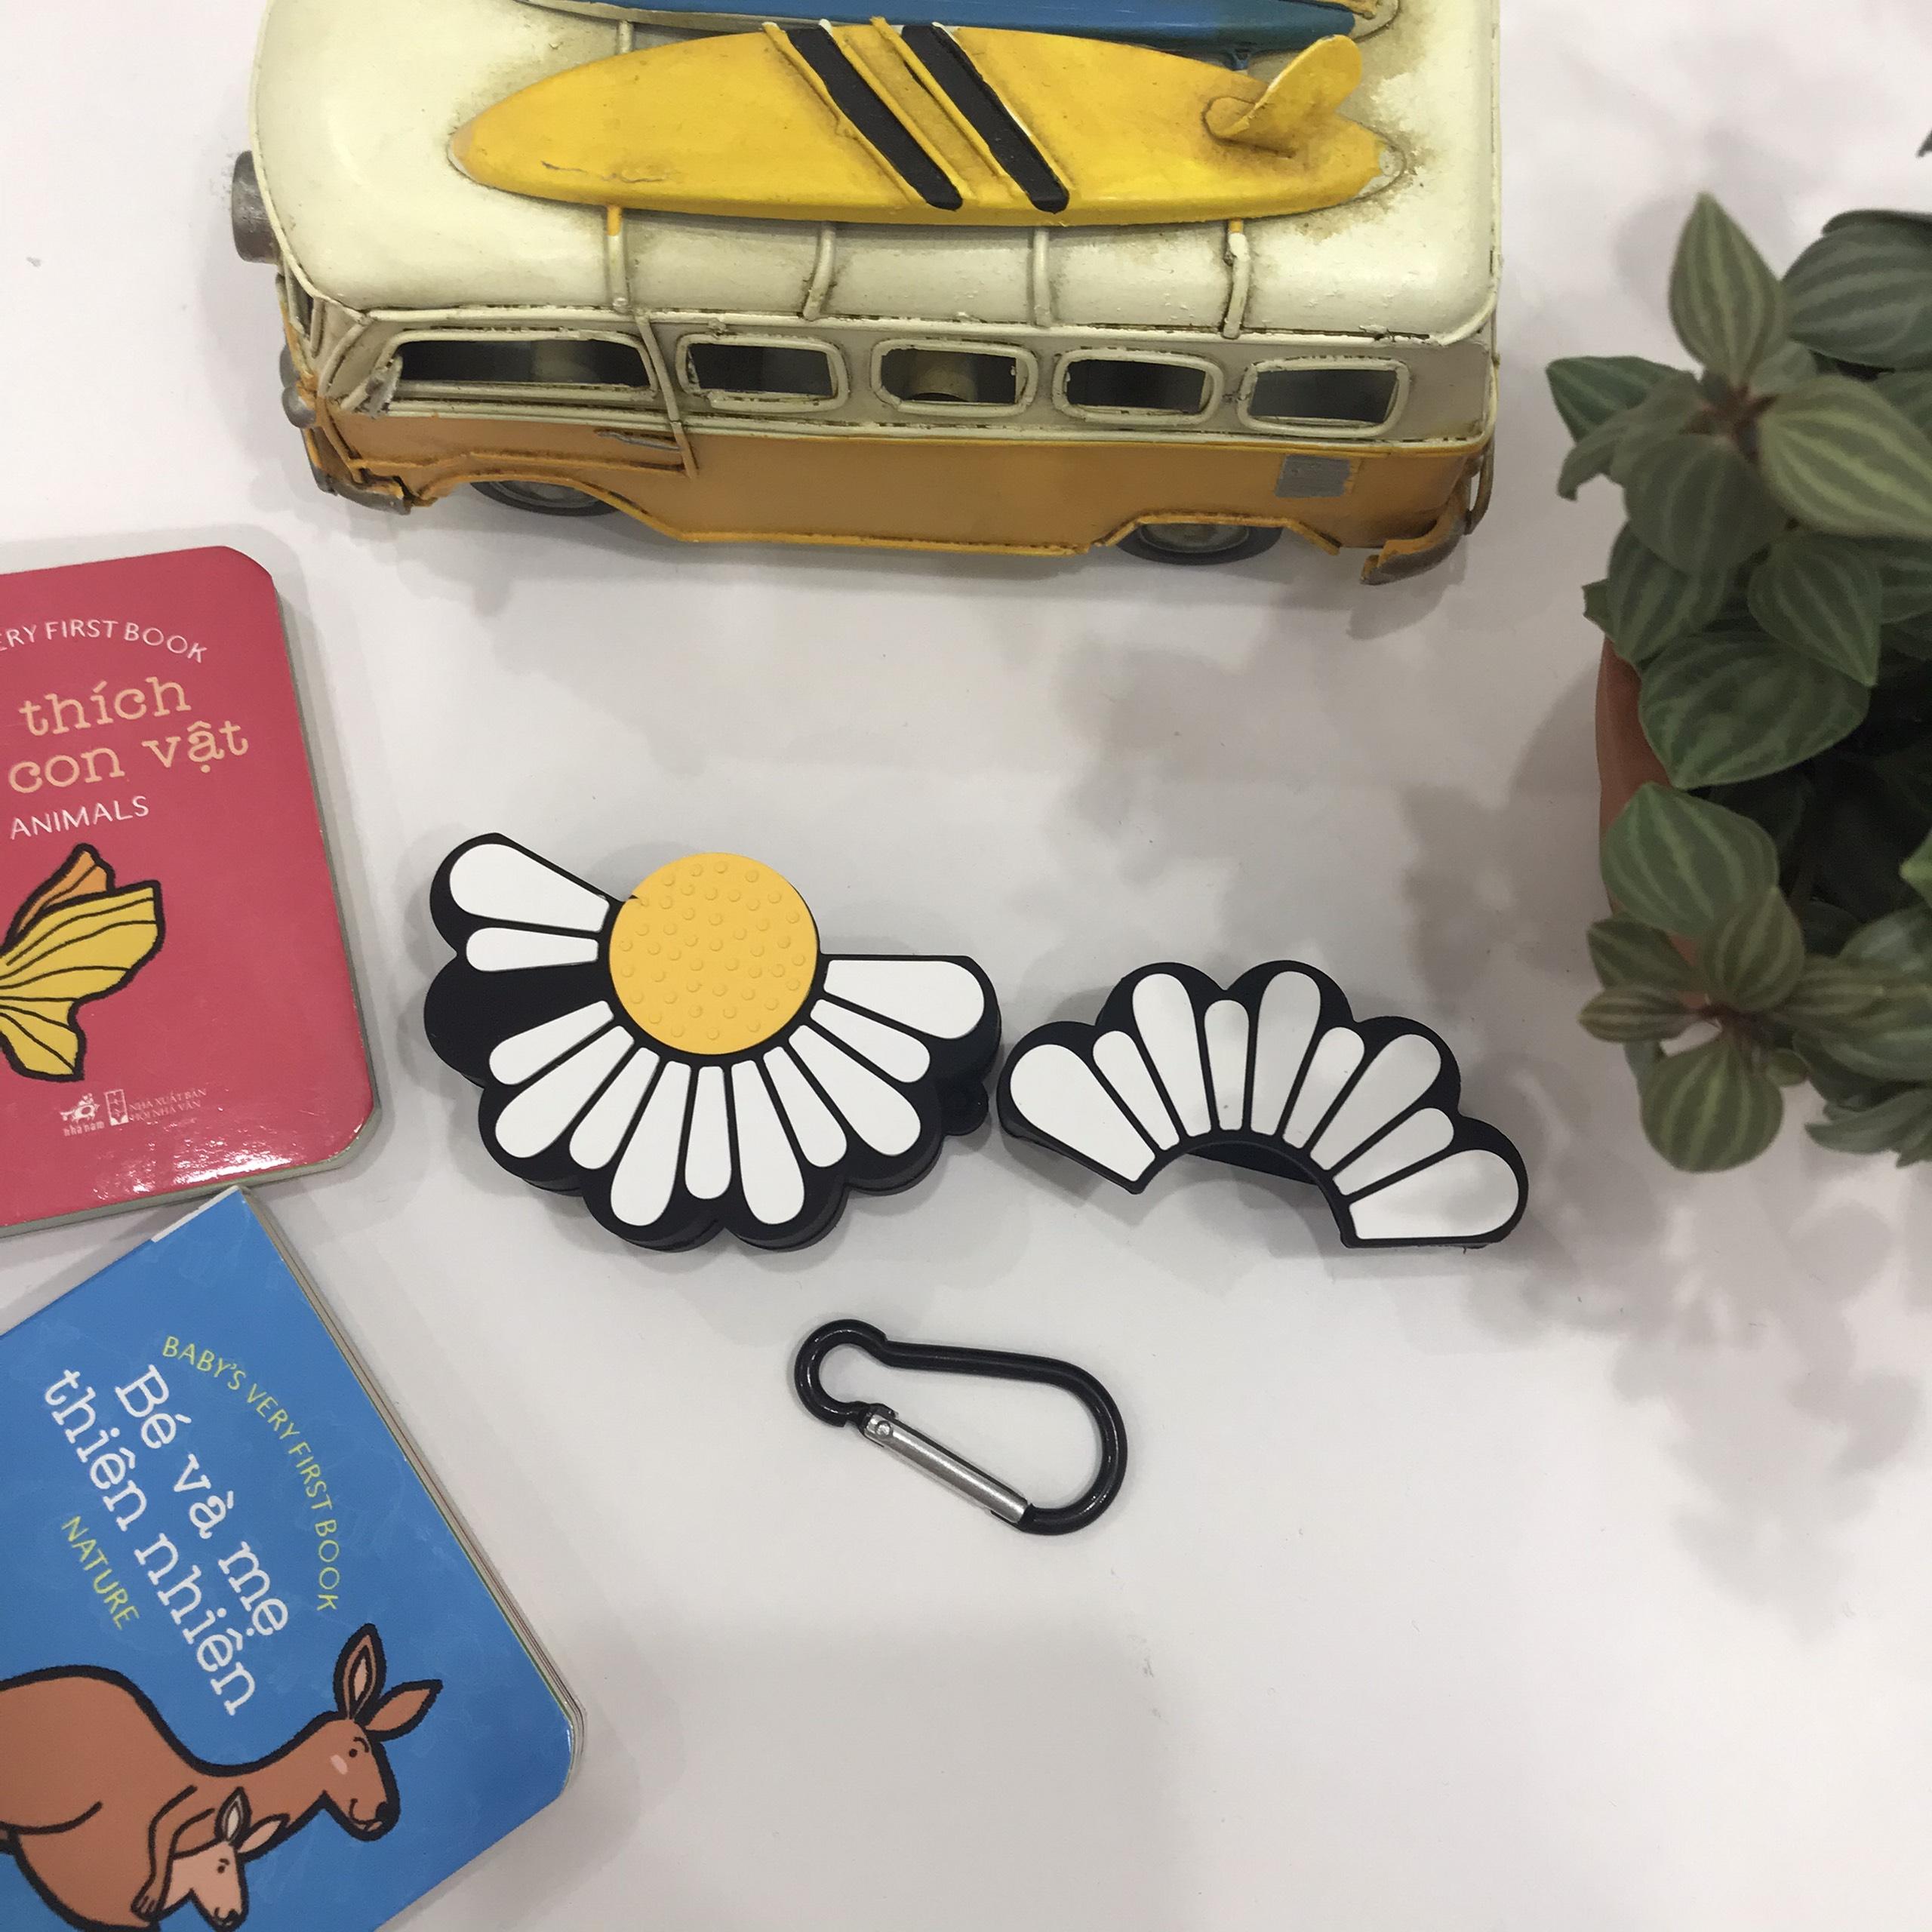 Bao Case Silicon Cho Tai Nghe Apple AirPods Pro - Hình Hoa Cúc